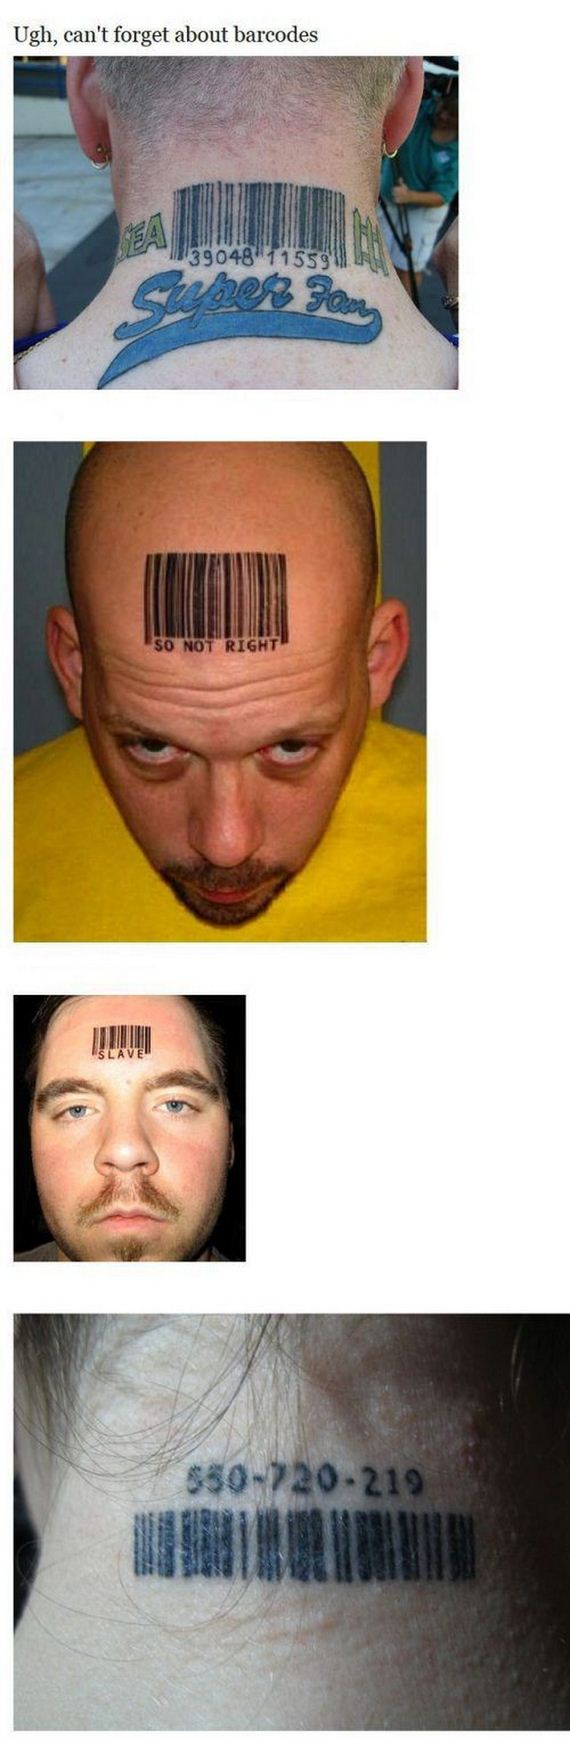 04-human-stupidity